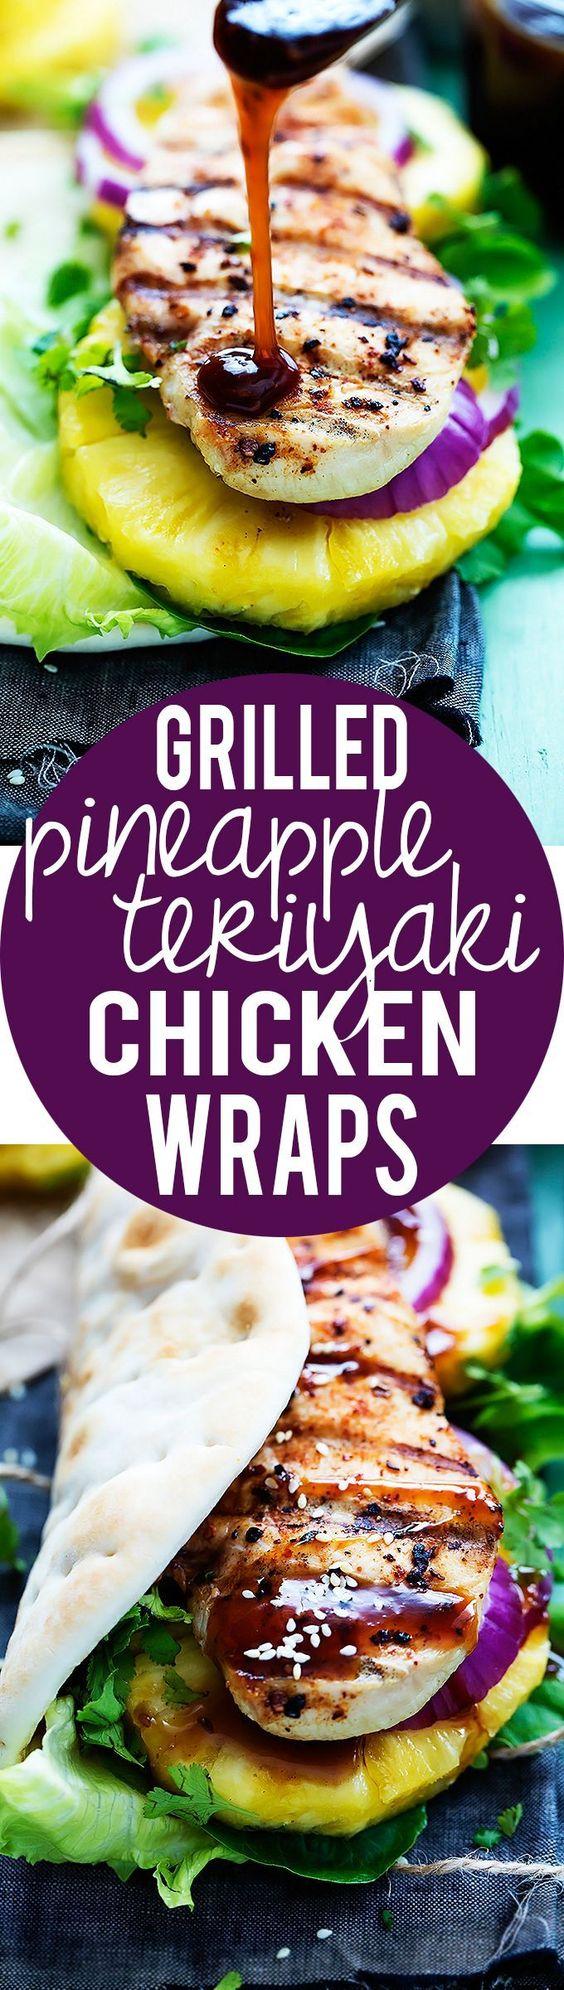 Grilled Pineapple Chicken Teriyaki Wraps | Creme de la Crumb